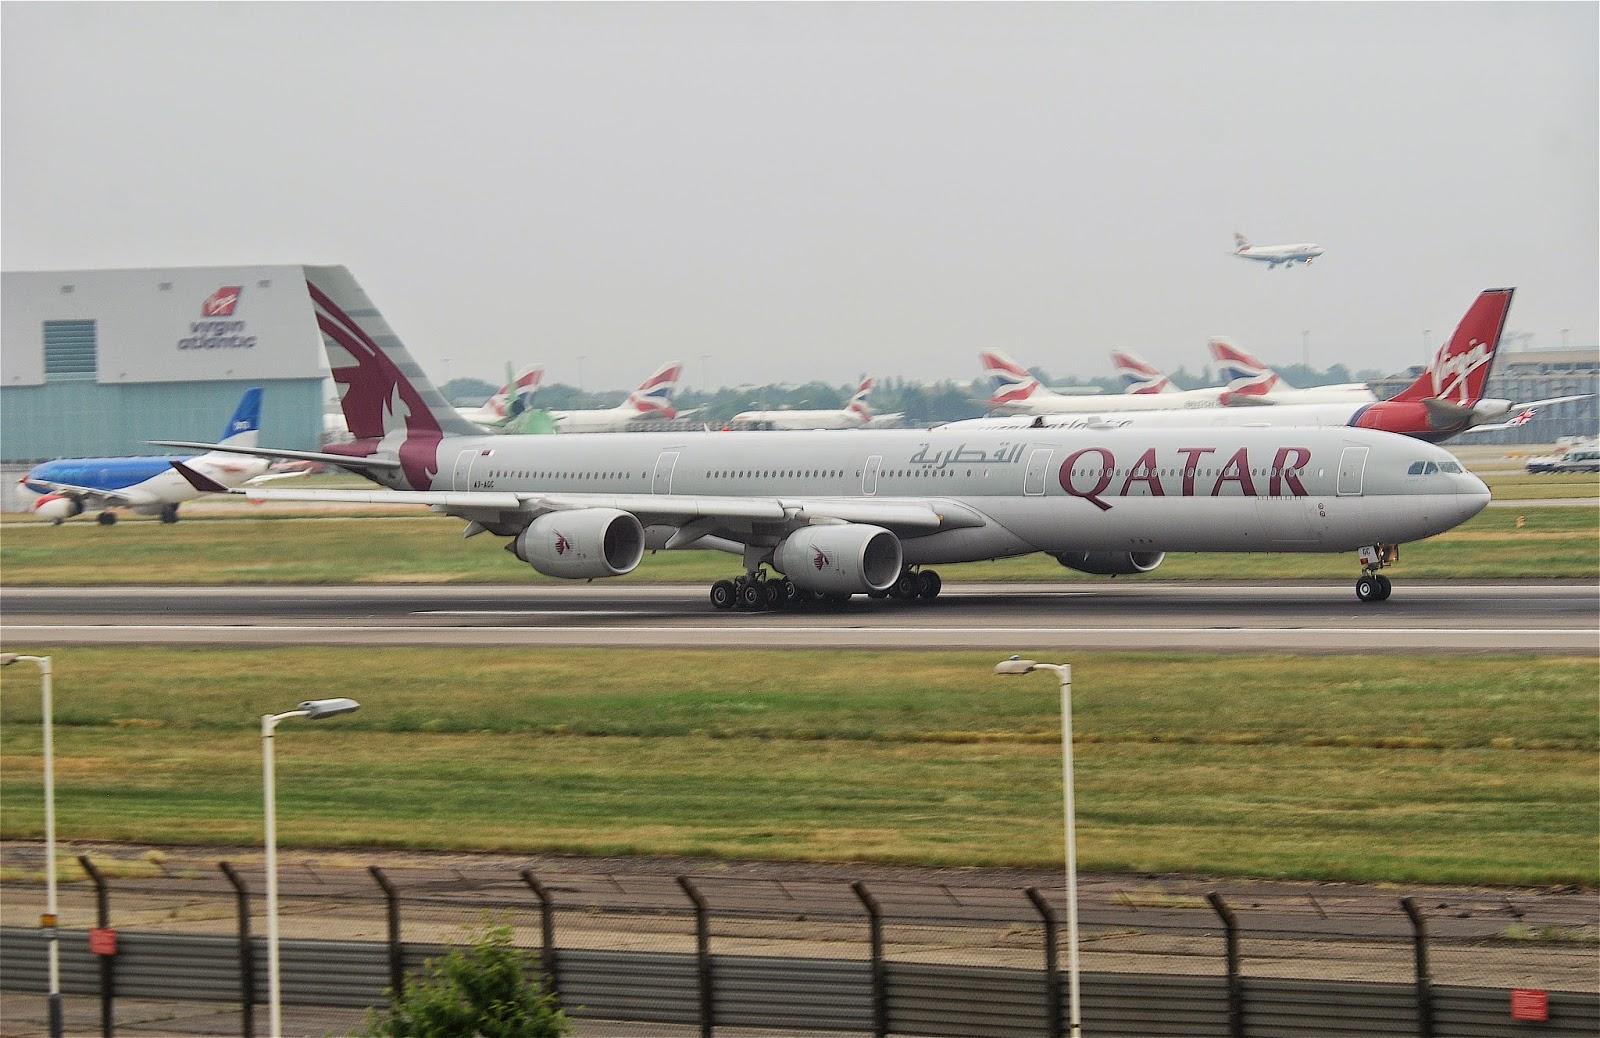 Behramjee's Airline News: Qatar Airways new Airbus A340 ...